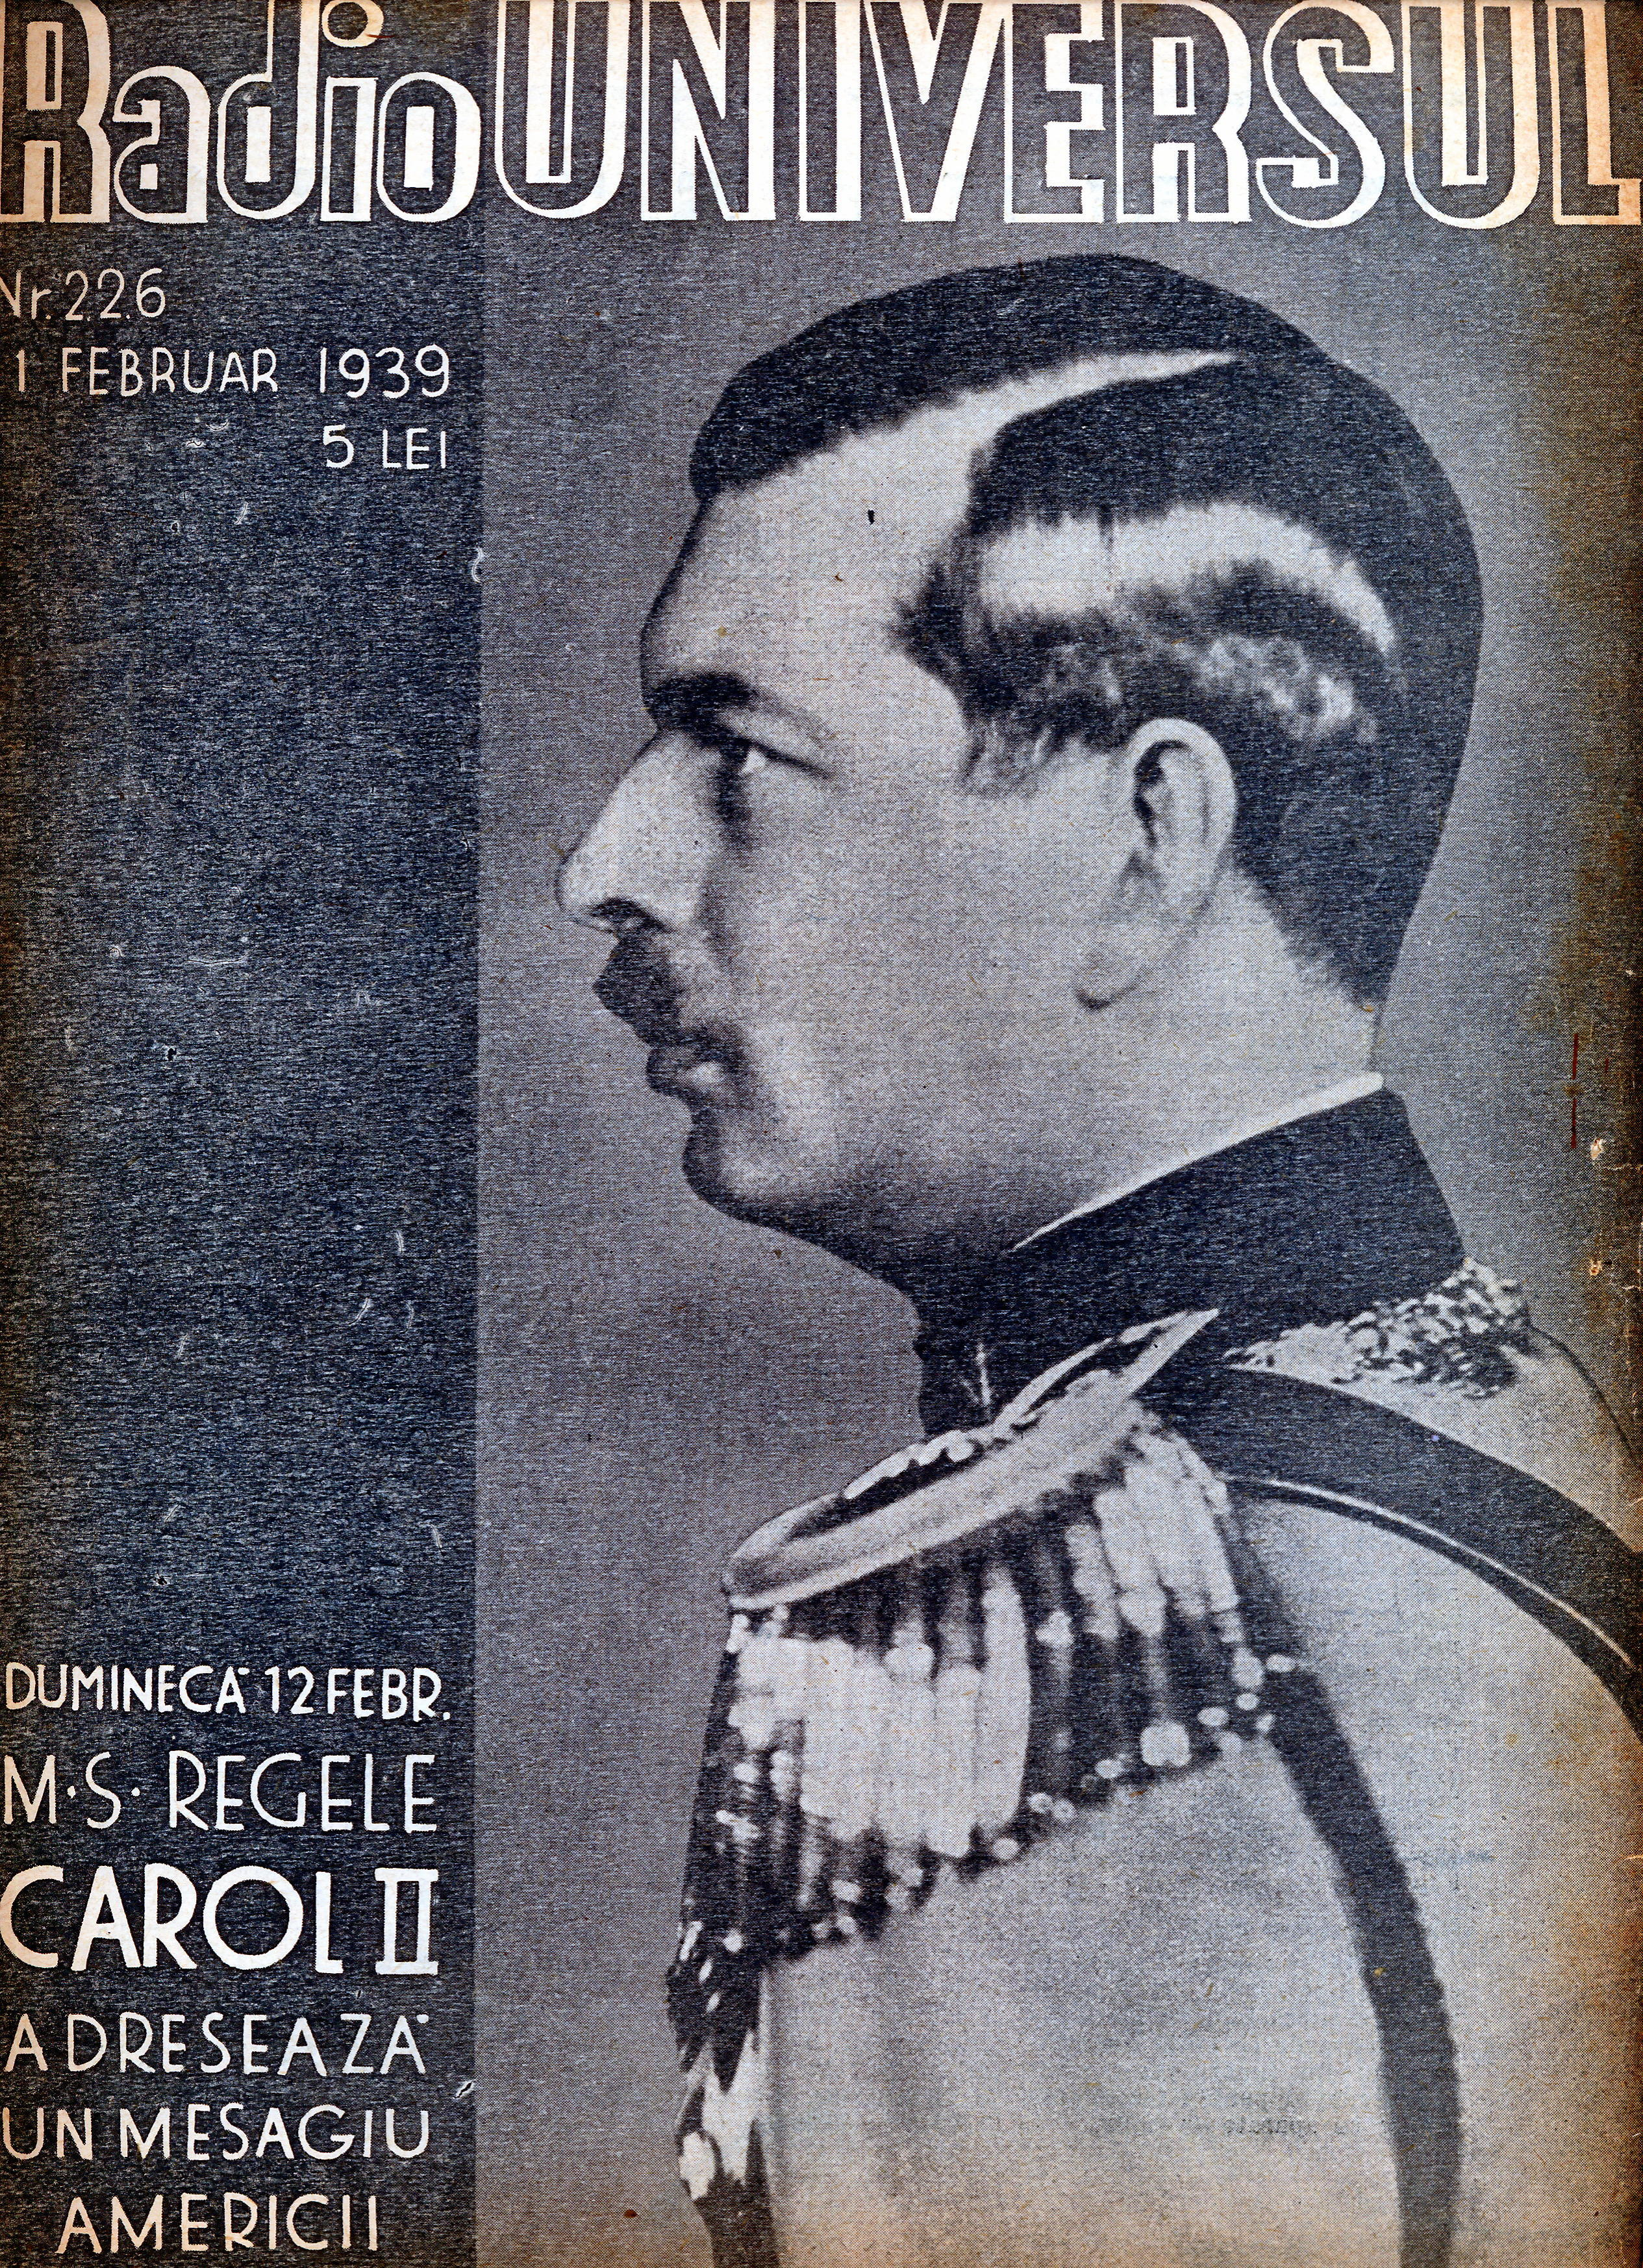 Revista Radio Universul, 1939, Arhiva scrisă a SRR